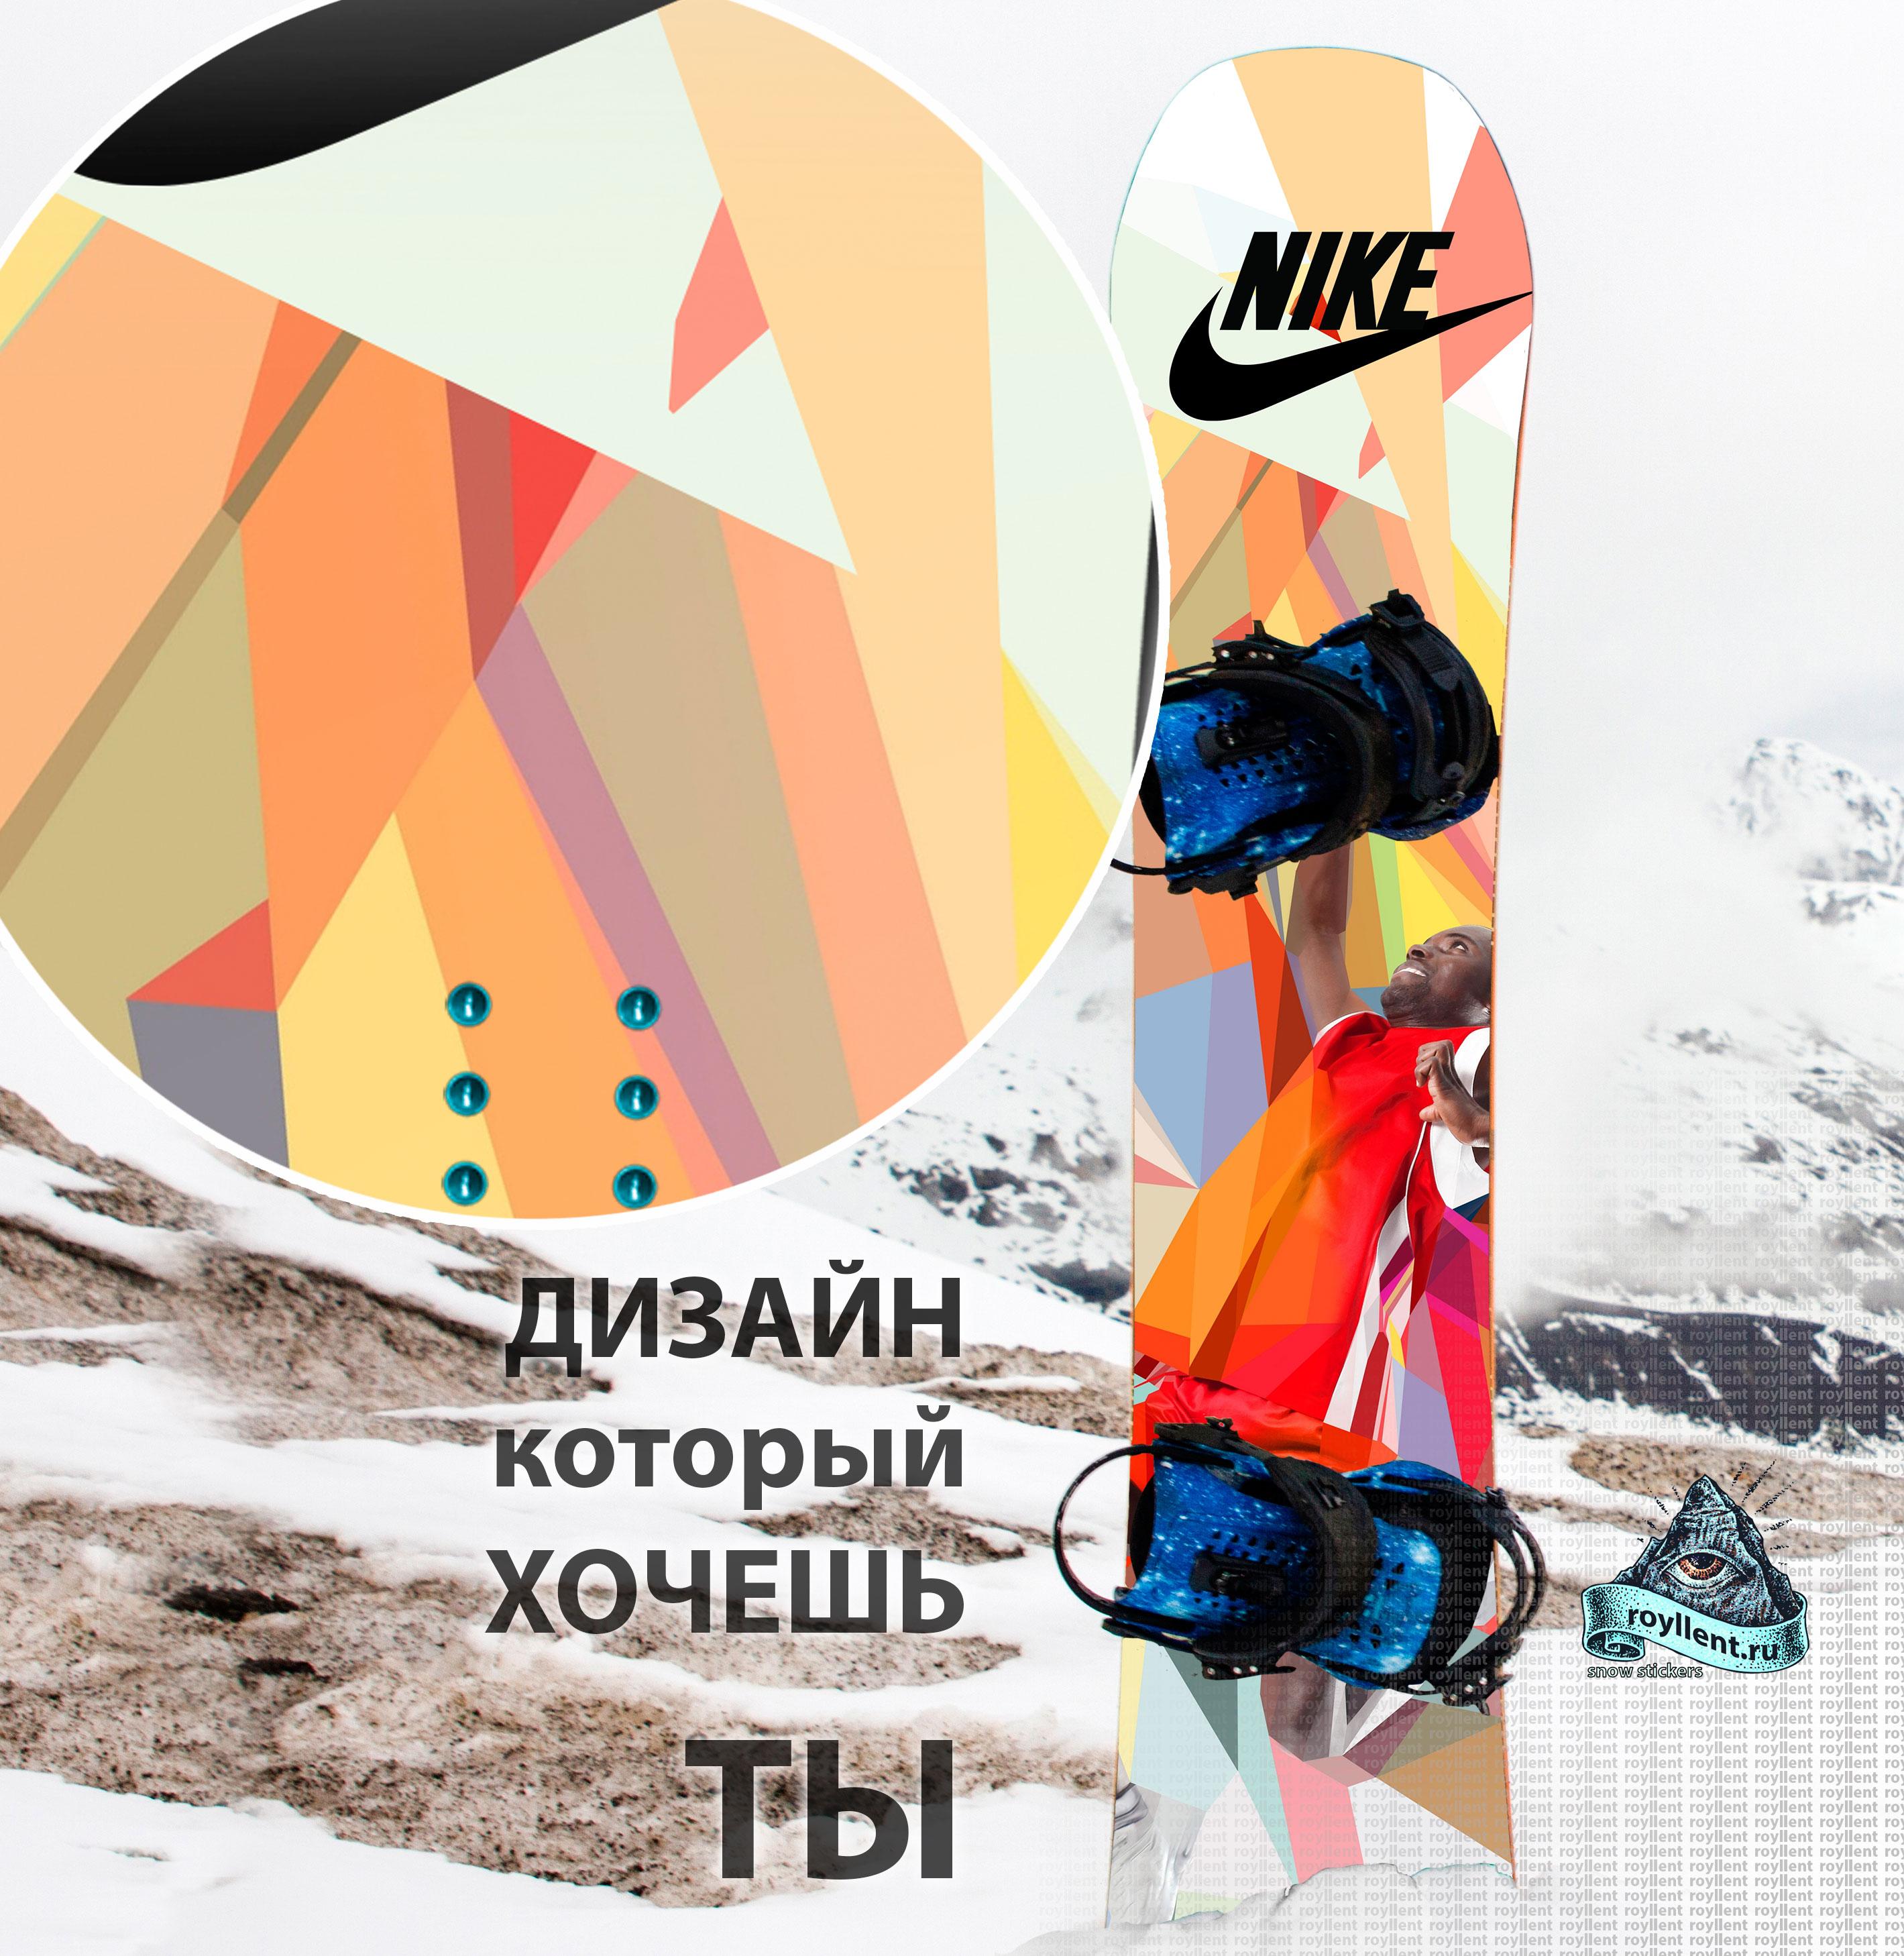 Сноуборд наклека на доску Nike Logo Basketball sport